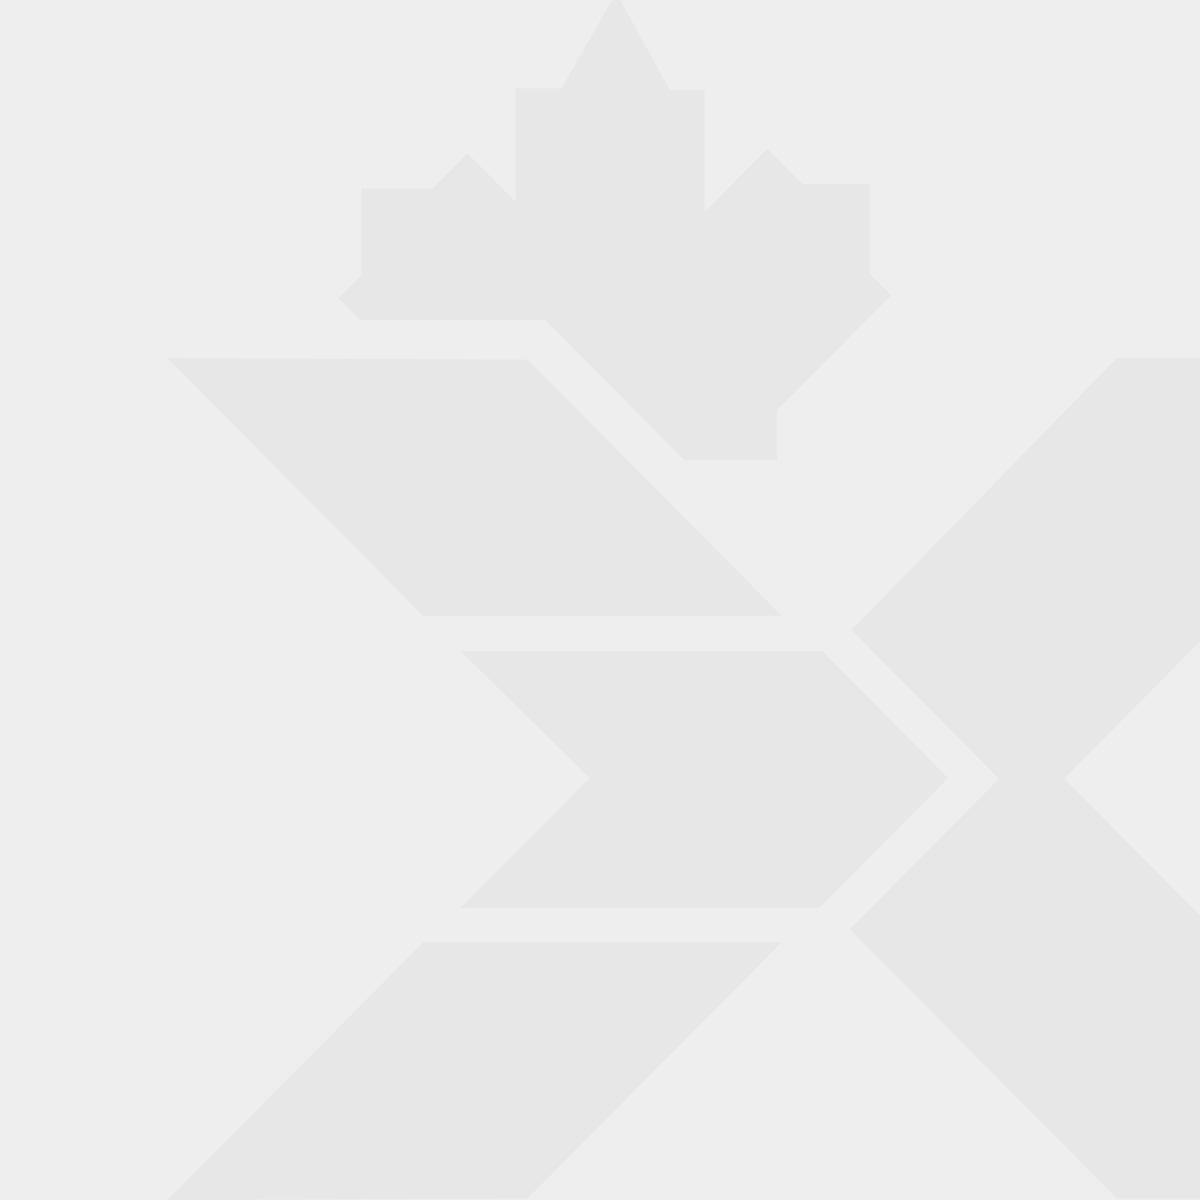 Michael Kors Darci Women's Rose Gold Analog Watch (MK3407)